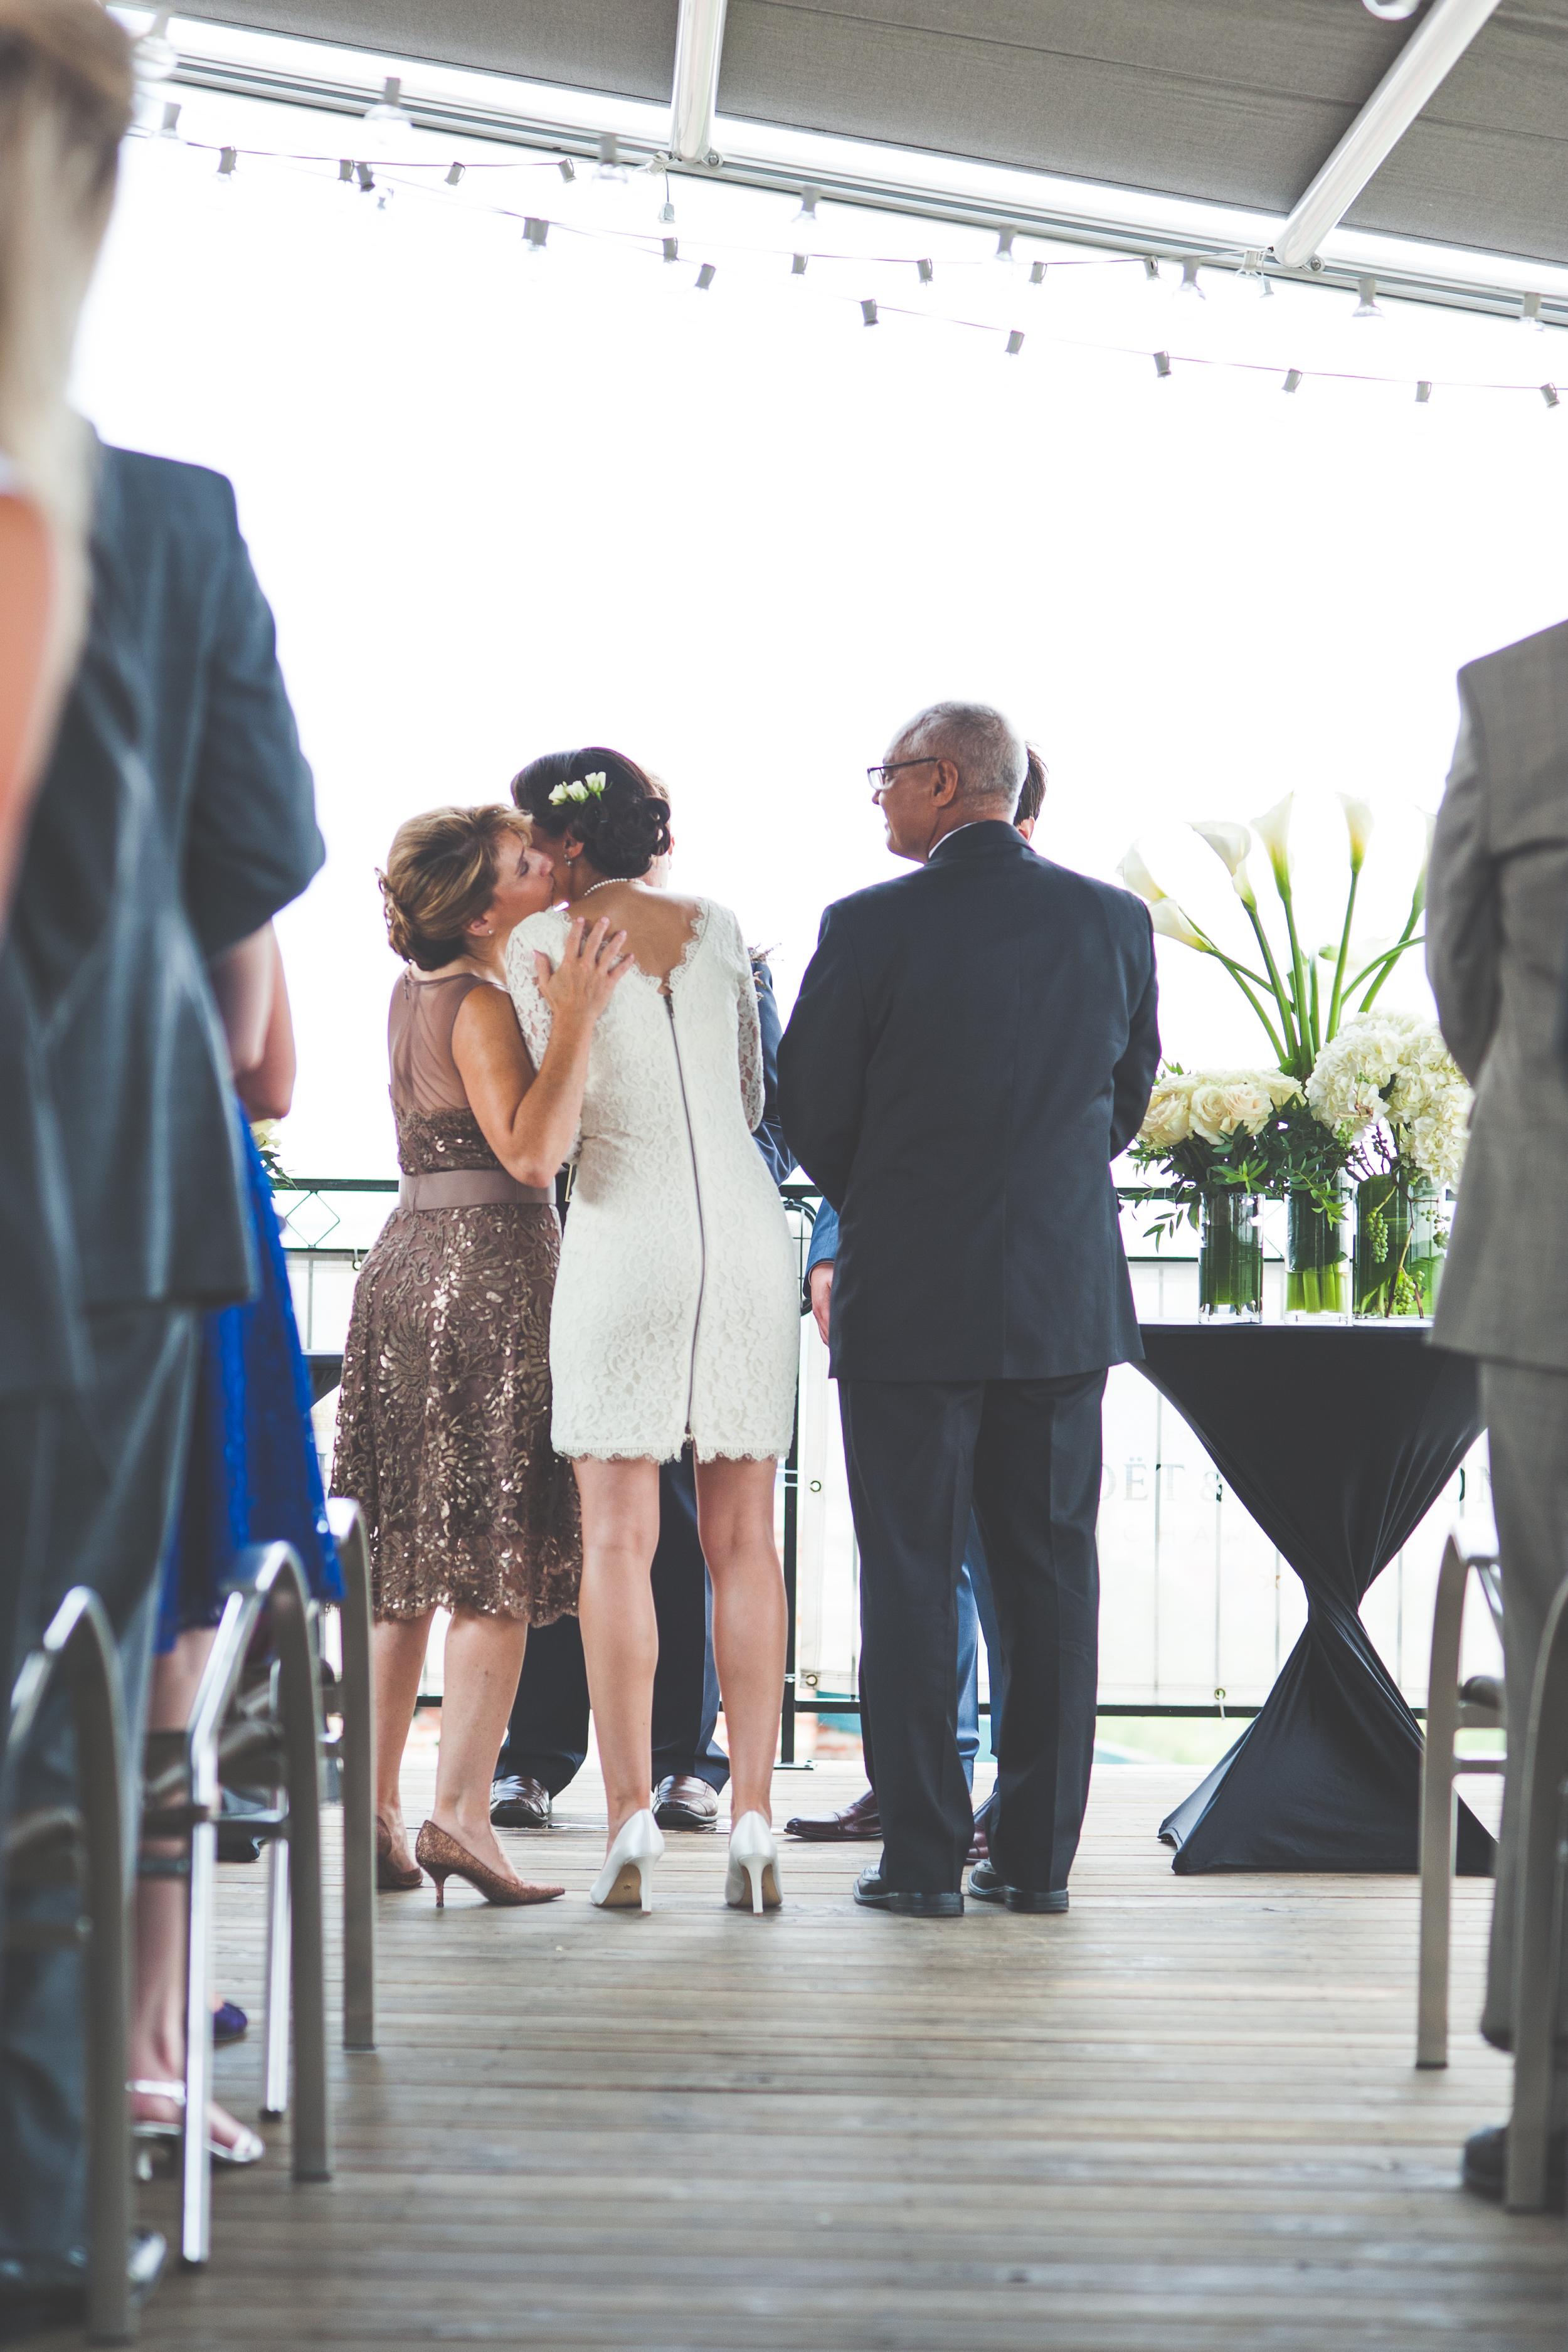 Wedding (3 of 17).JPG